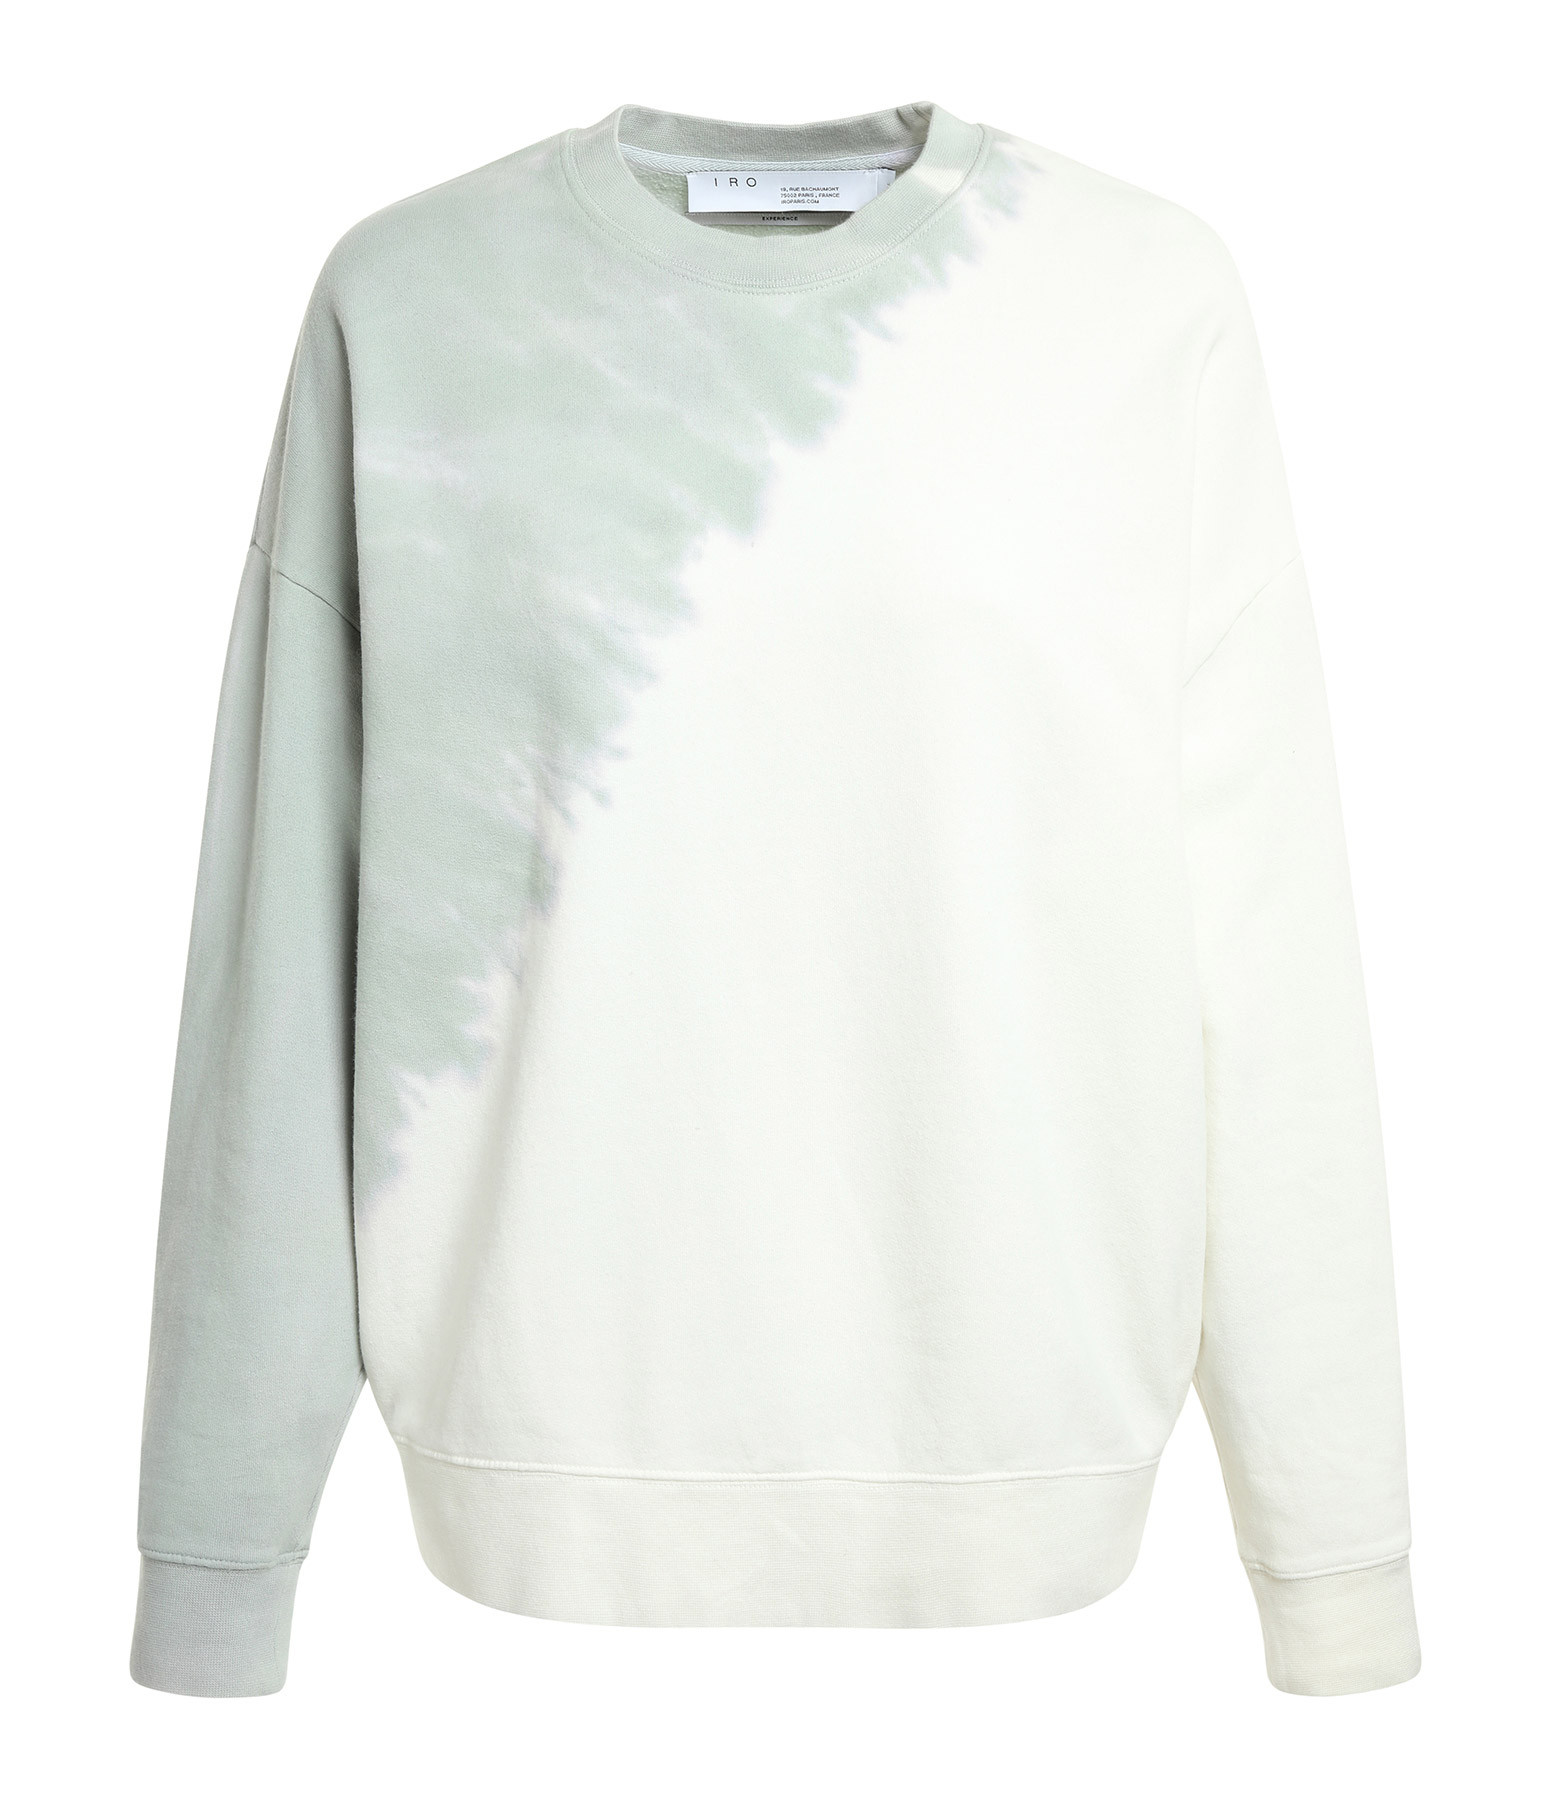 IRO - Sweatshirt Baylor Coton Bleu